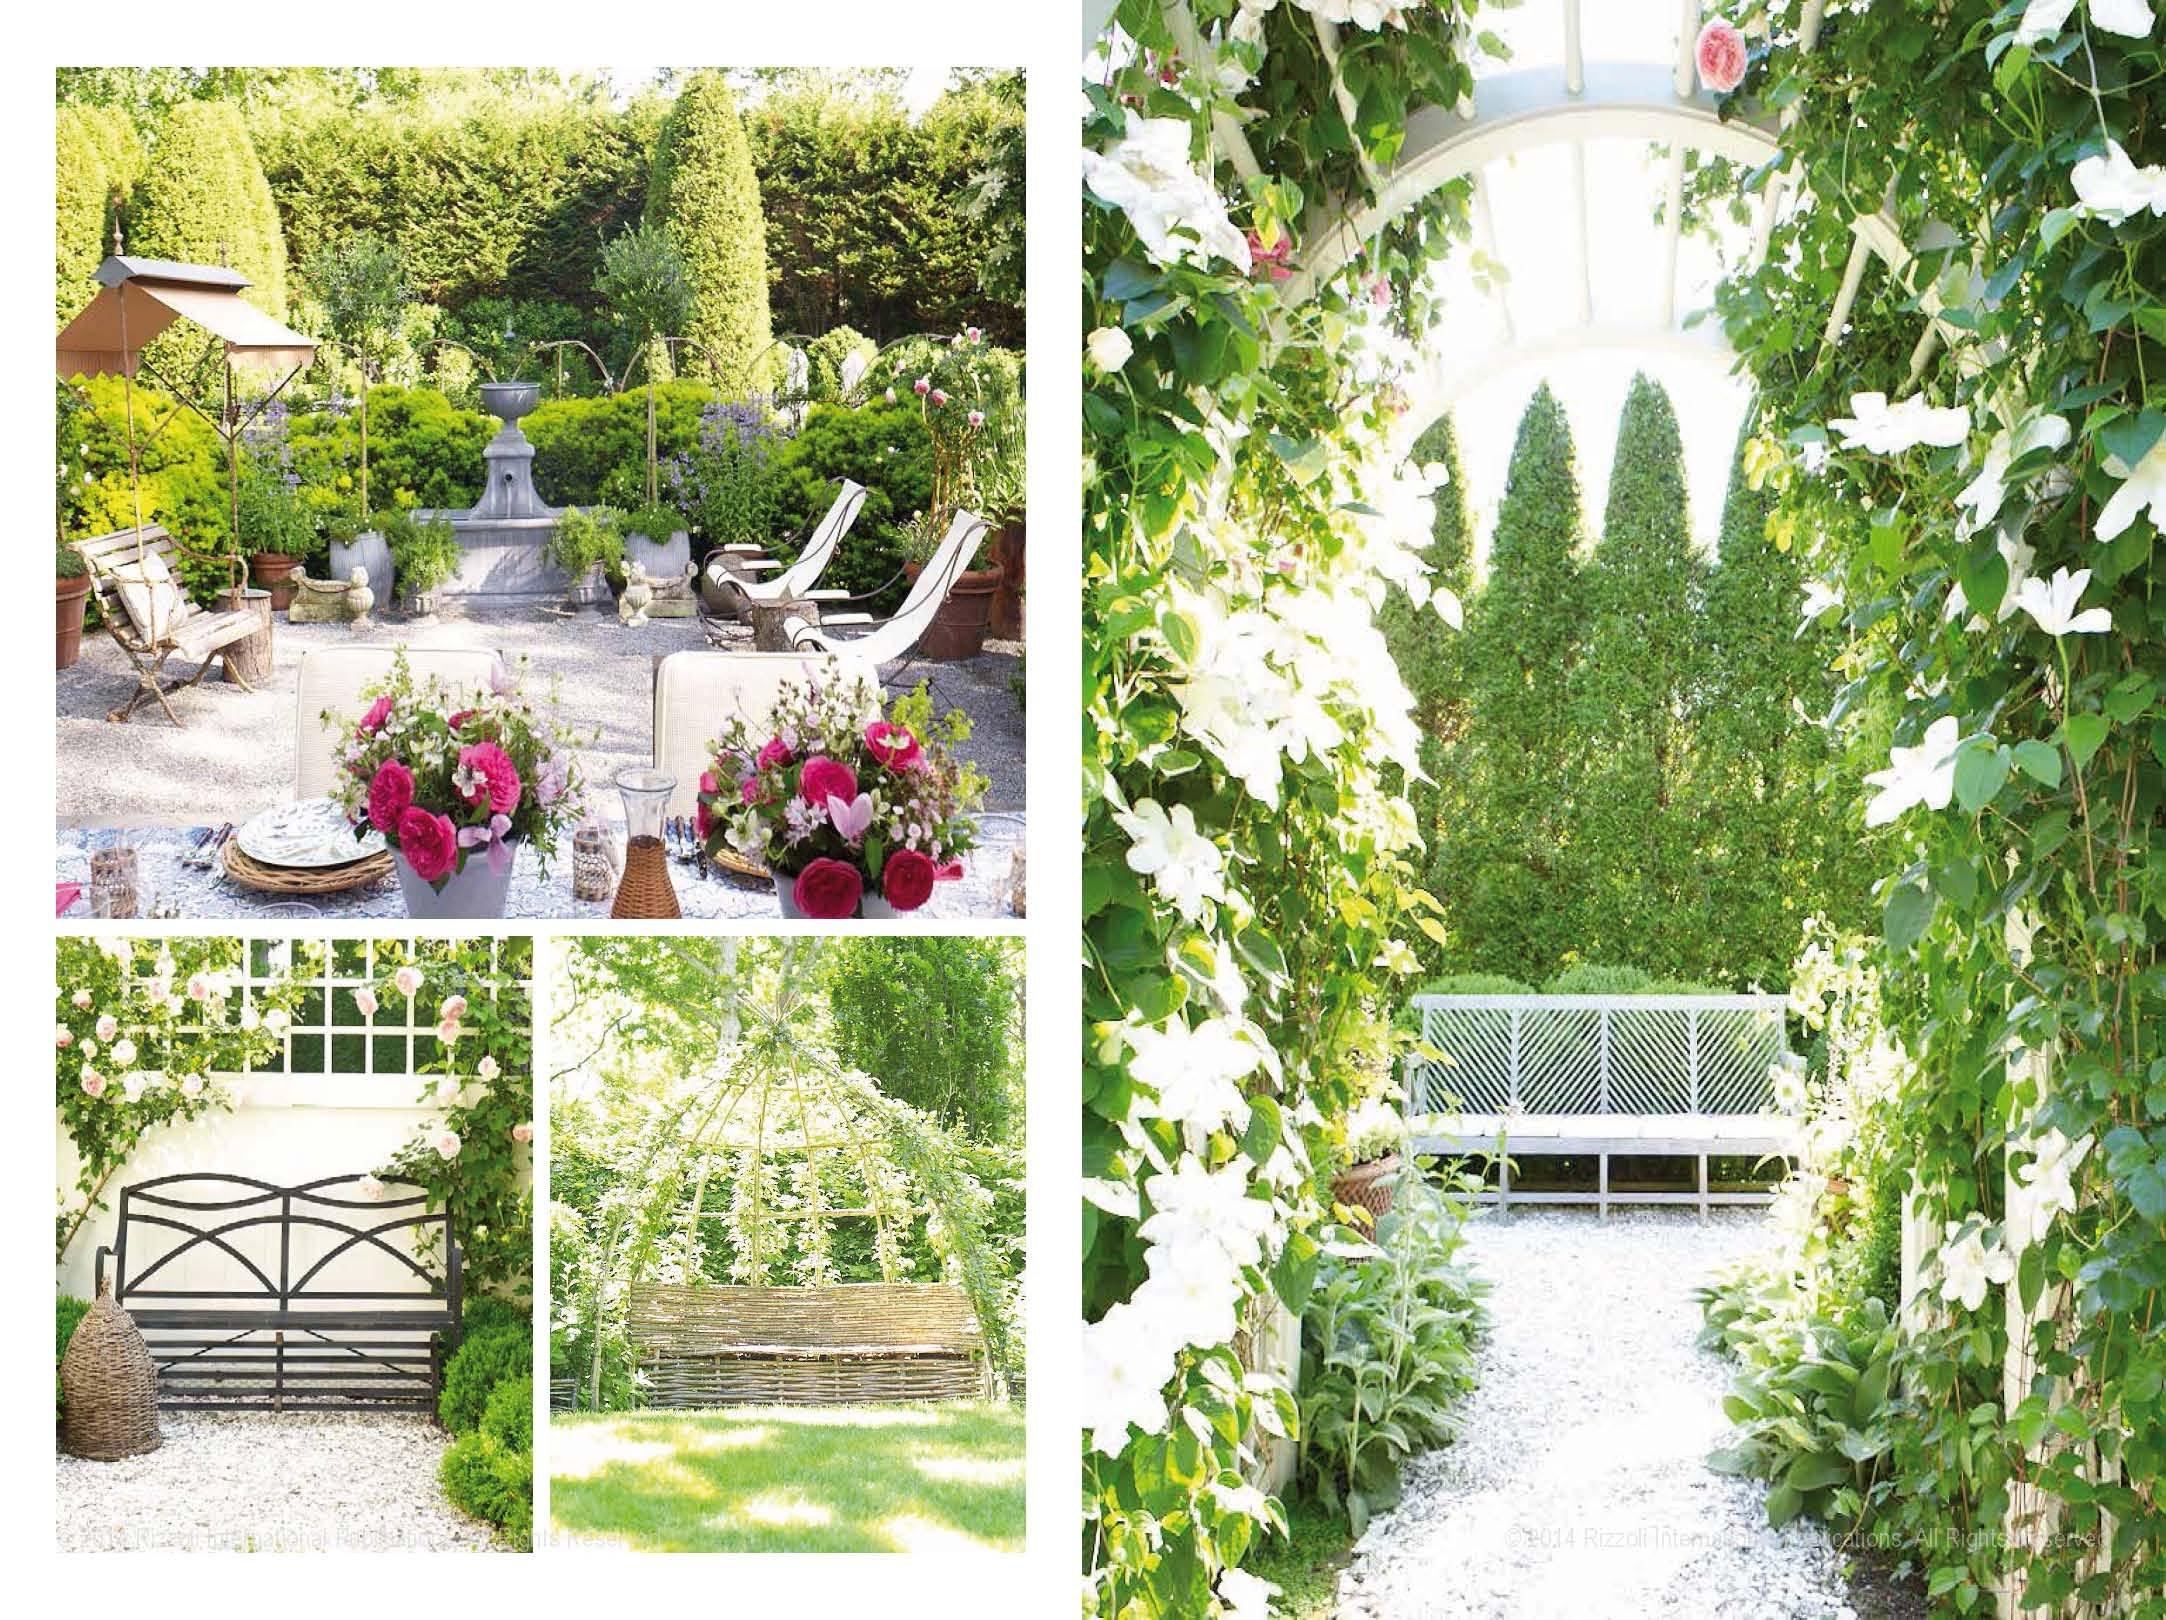 Lovely Charlotte Moss: Garden Inspirations: Charlotte Moss, Barry Friedberg,  Barbara L. Dixon: 9780847844777: Amazon.com: Books